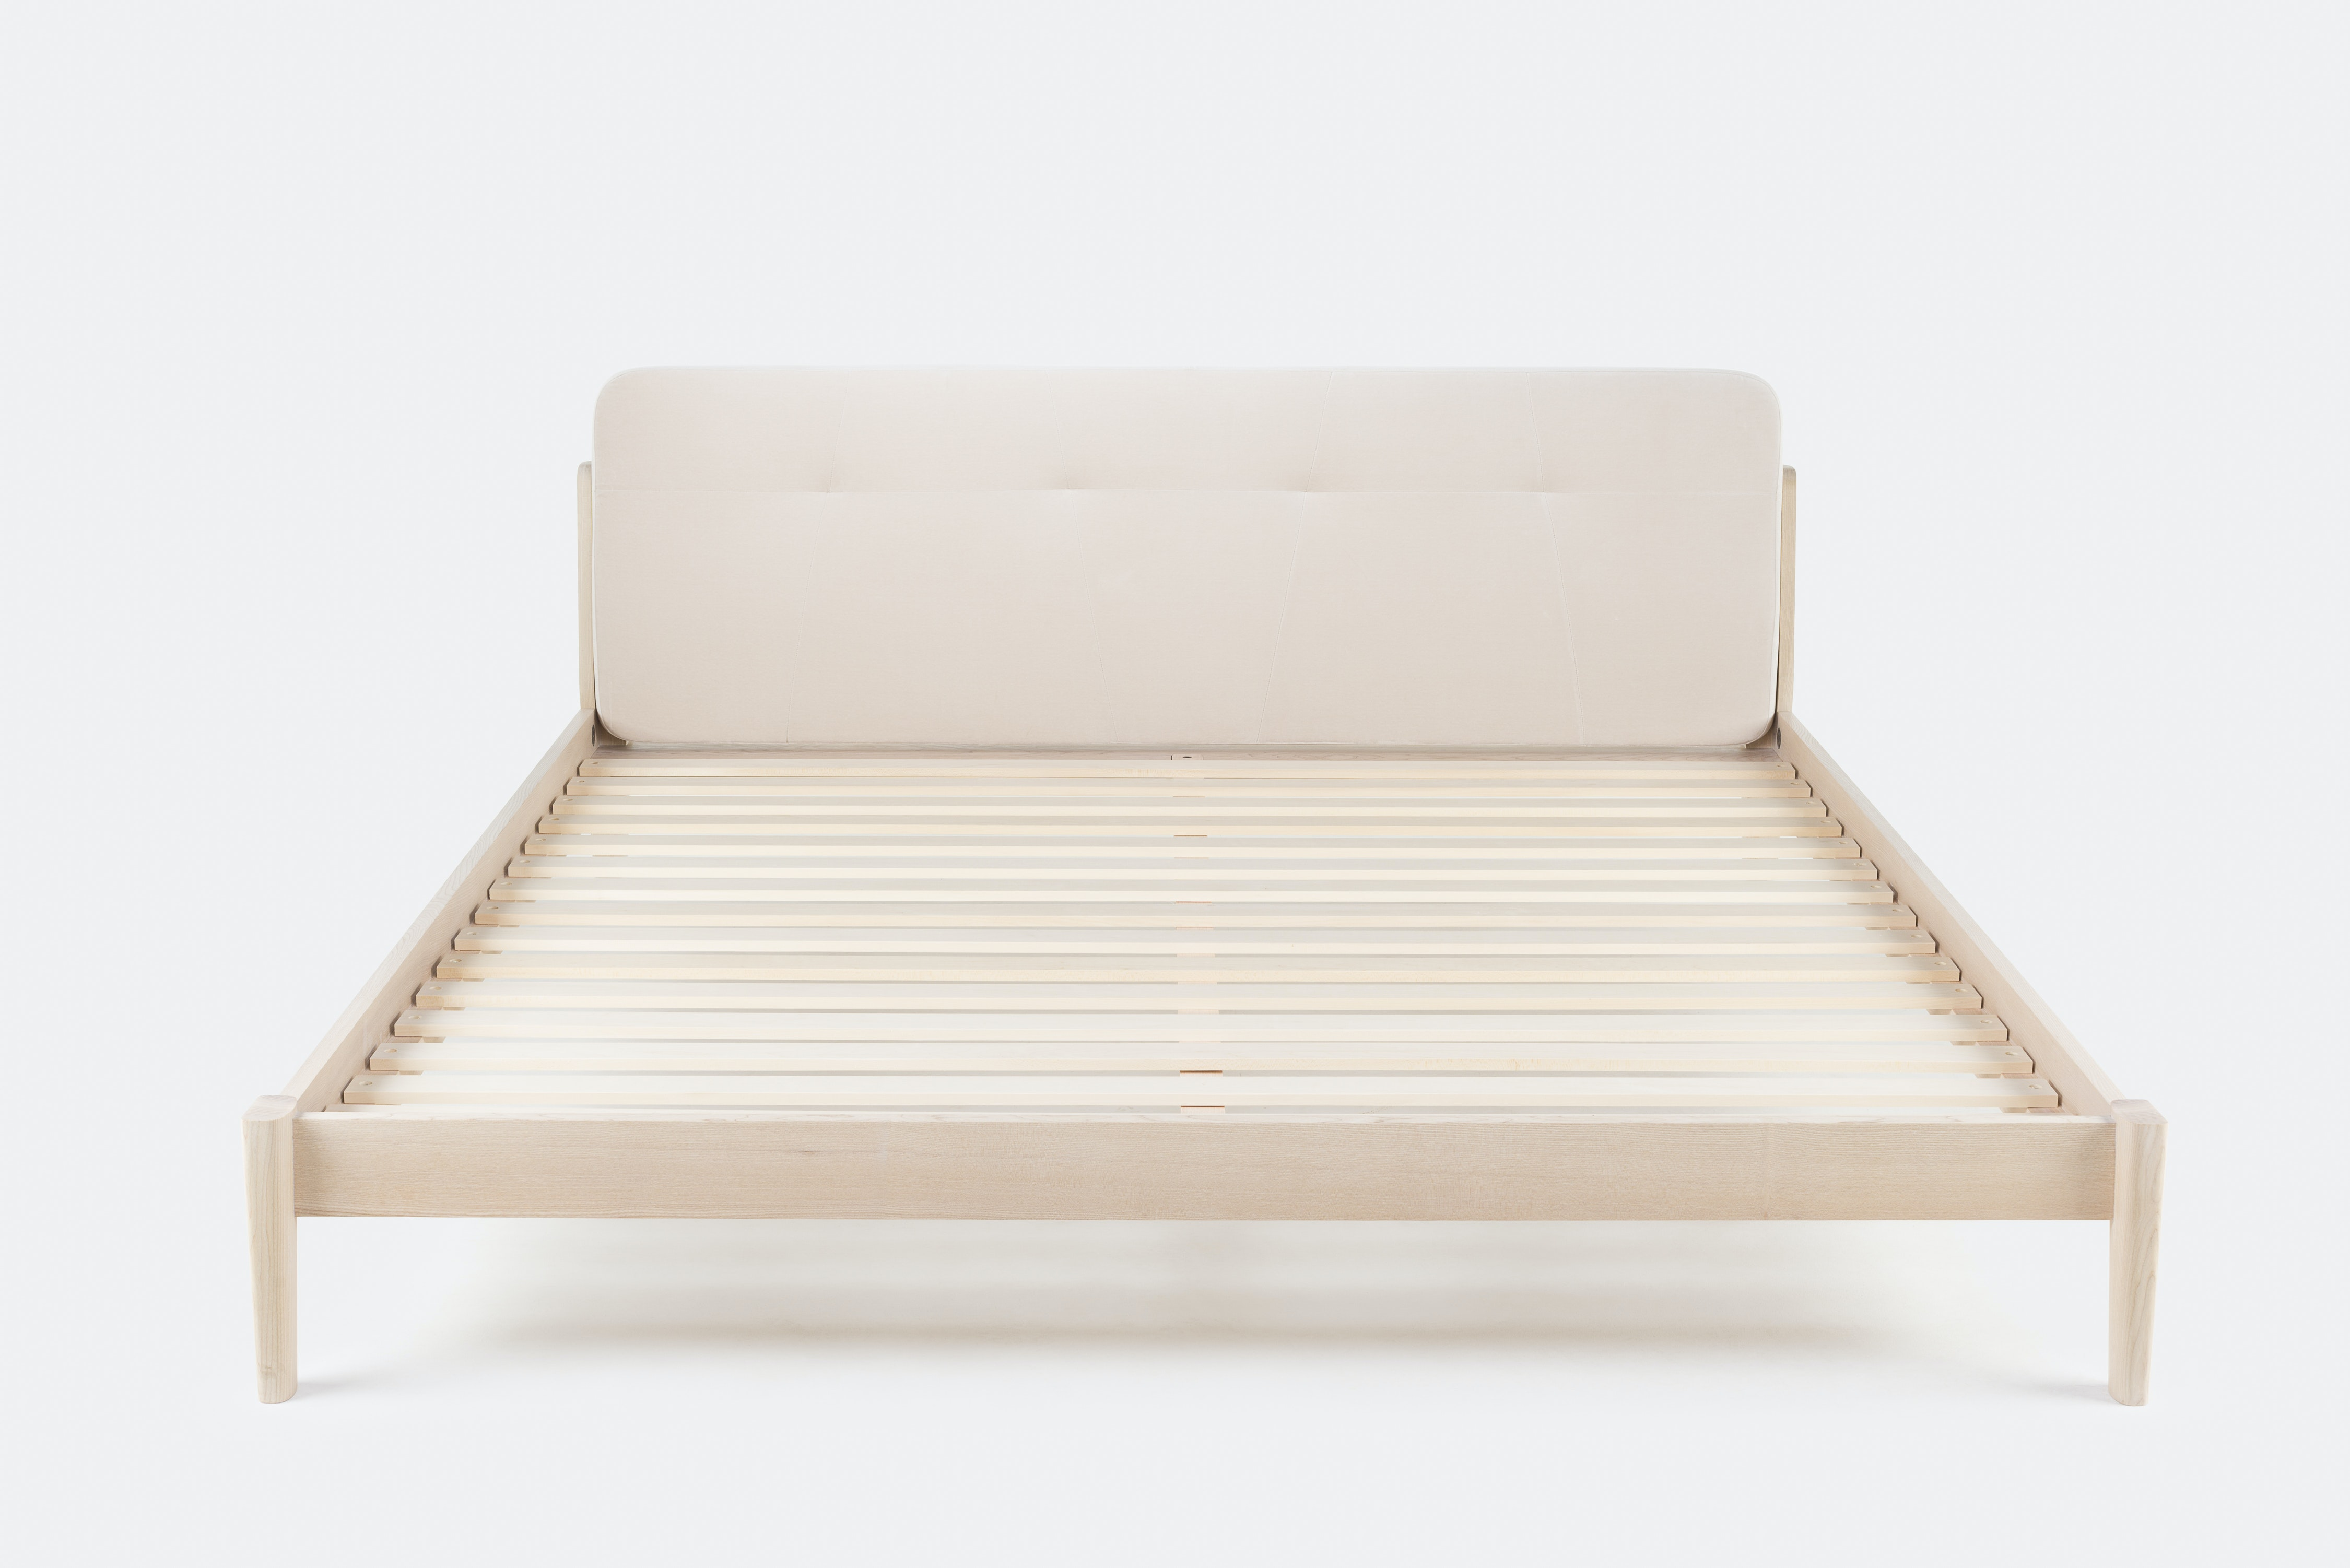 Capo Bed By Neri Hu No Mattress